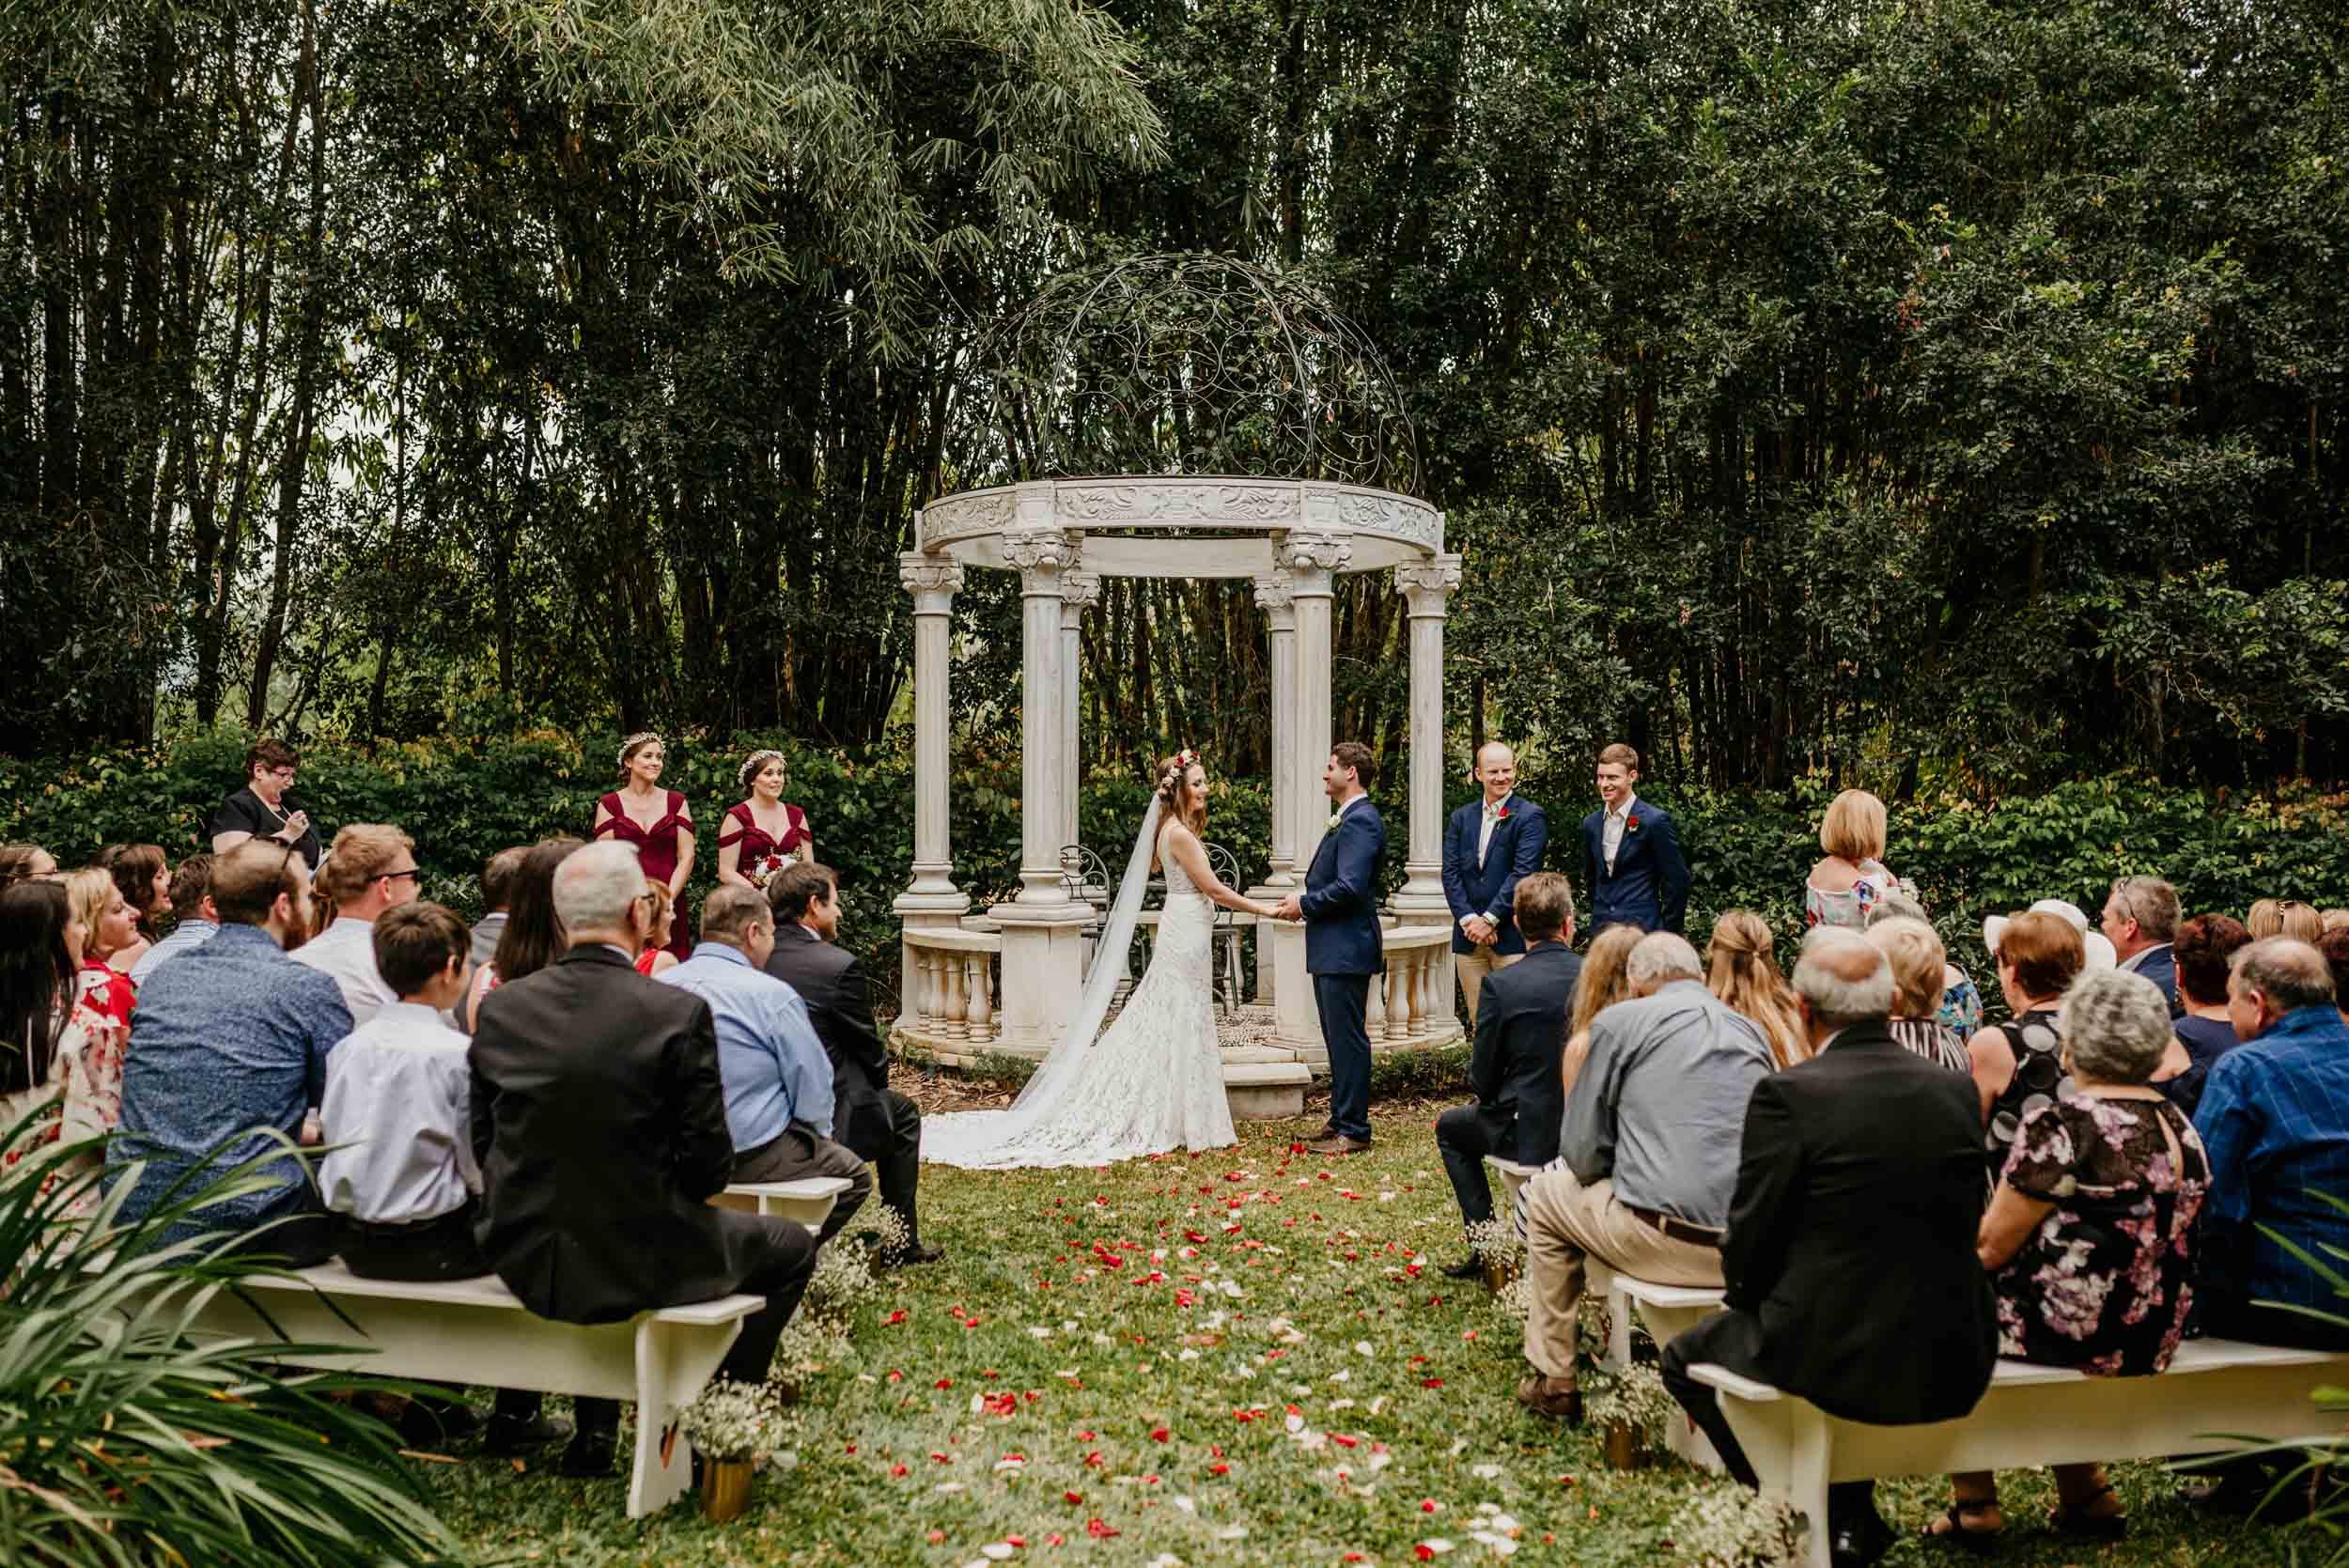 The Raw Photographer - Cairns Wedding Photographer - Laloli - Cairns Garden Ceremony - Cane Fields Photo Shoot-37.jpg